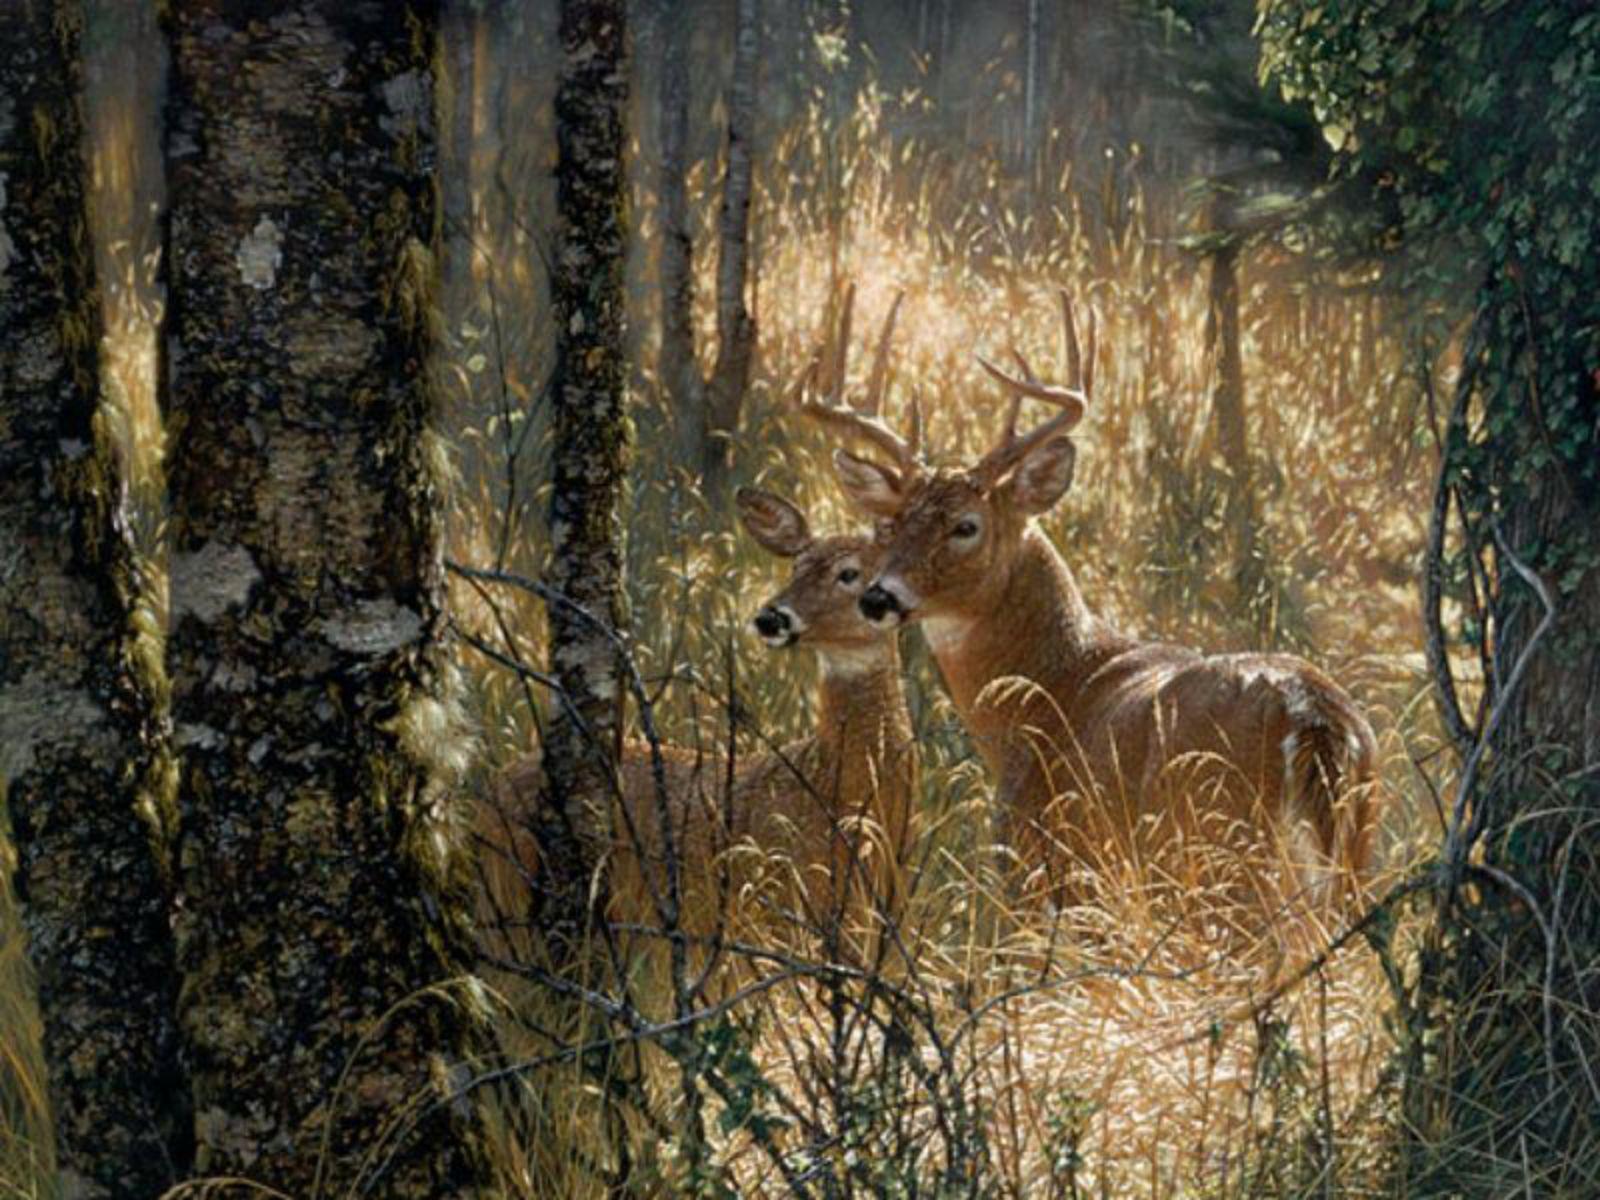 Deer Wallpaper For Iphone Download Wallpaper DaWallpaperz 1600x1200